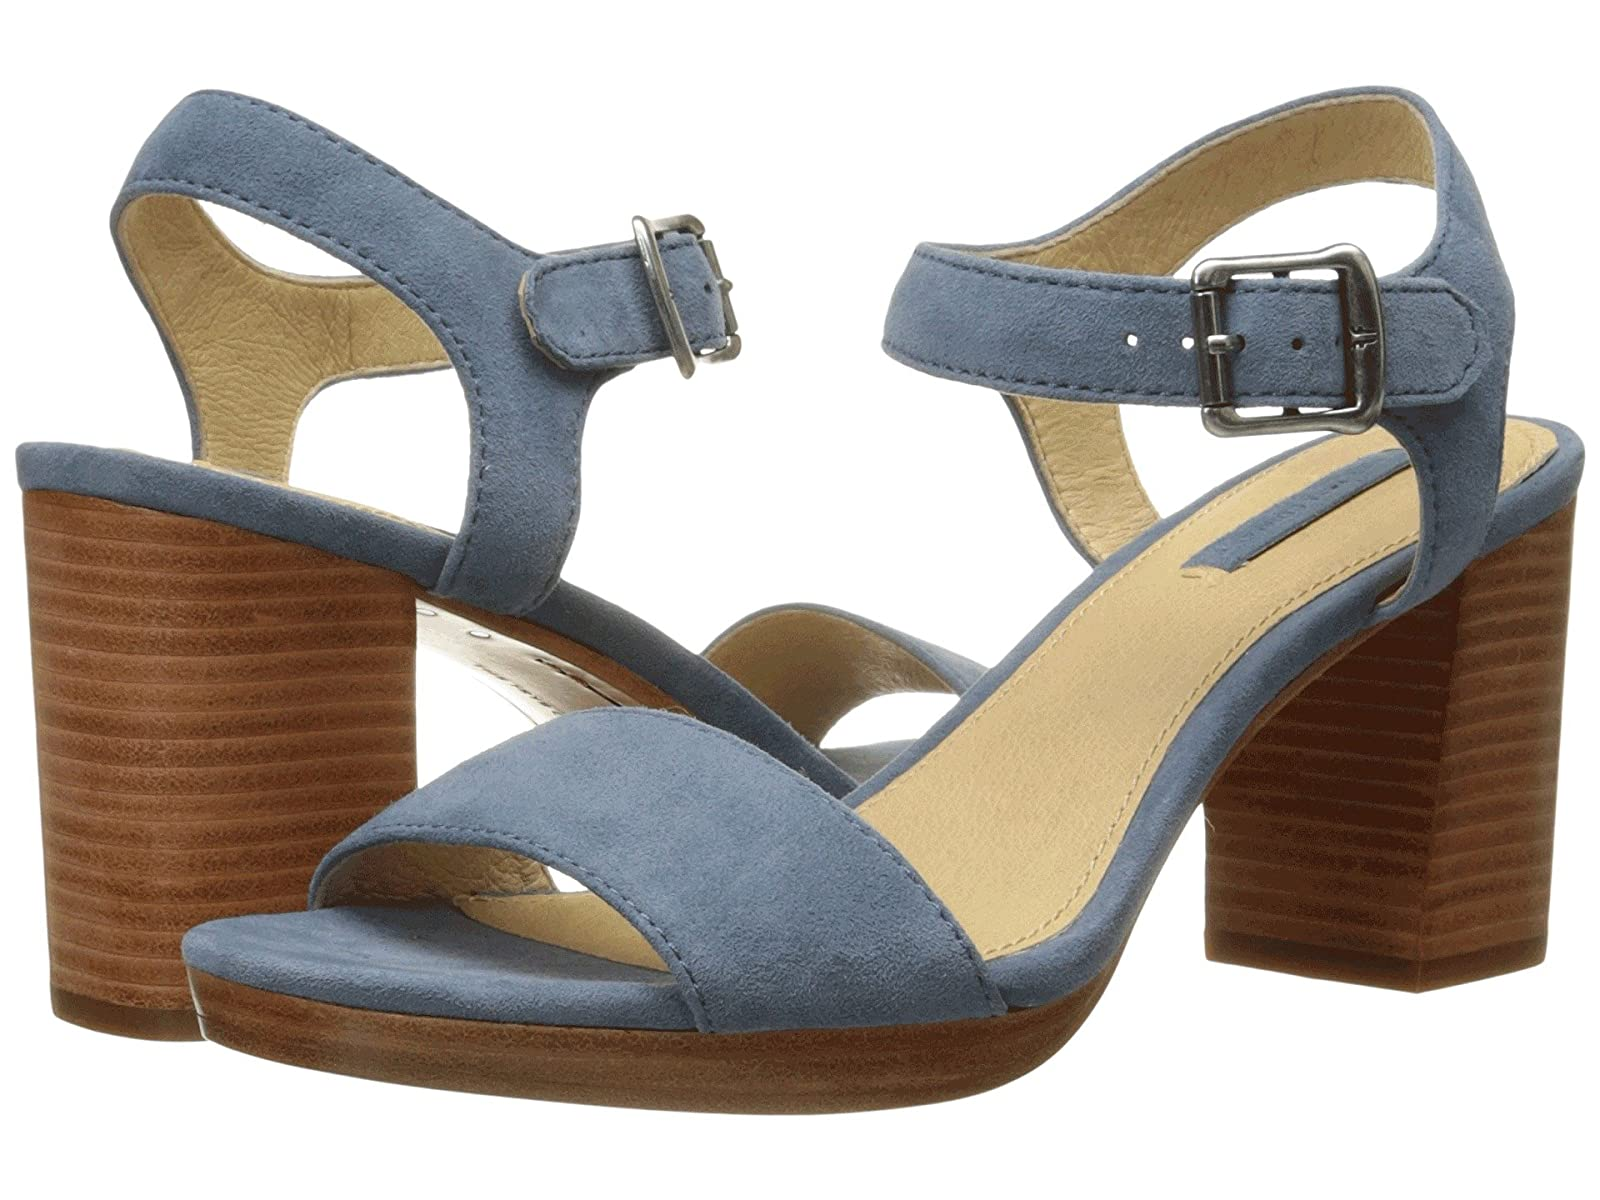 Frye Blake 2 PieceCheap and distinctive eye-catching shoes